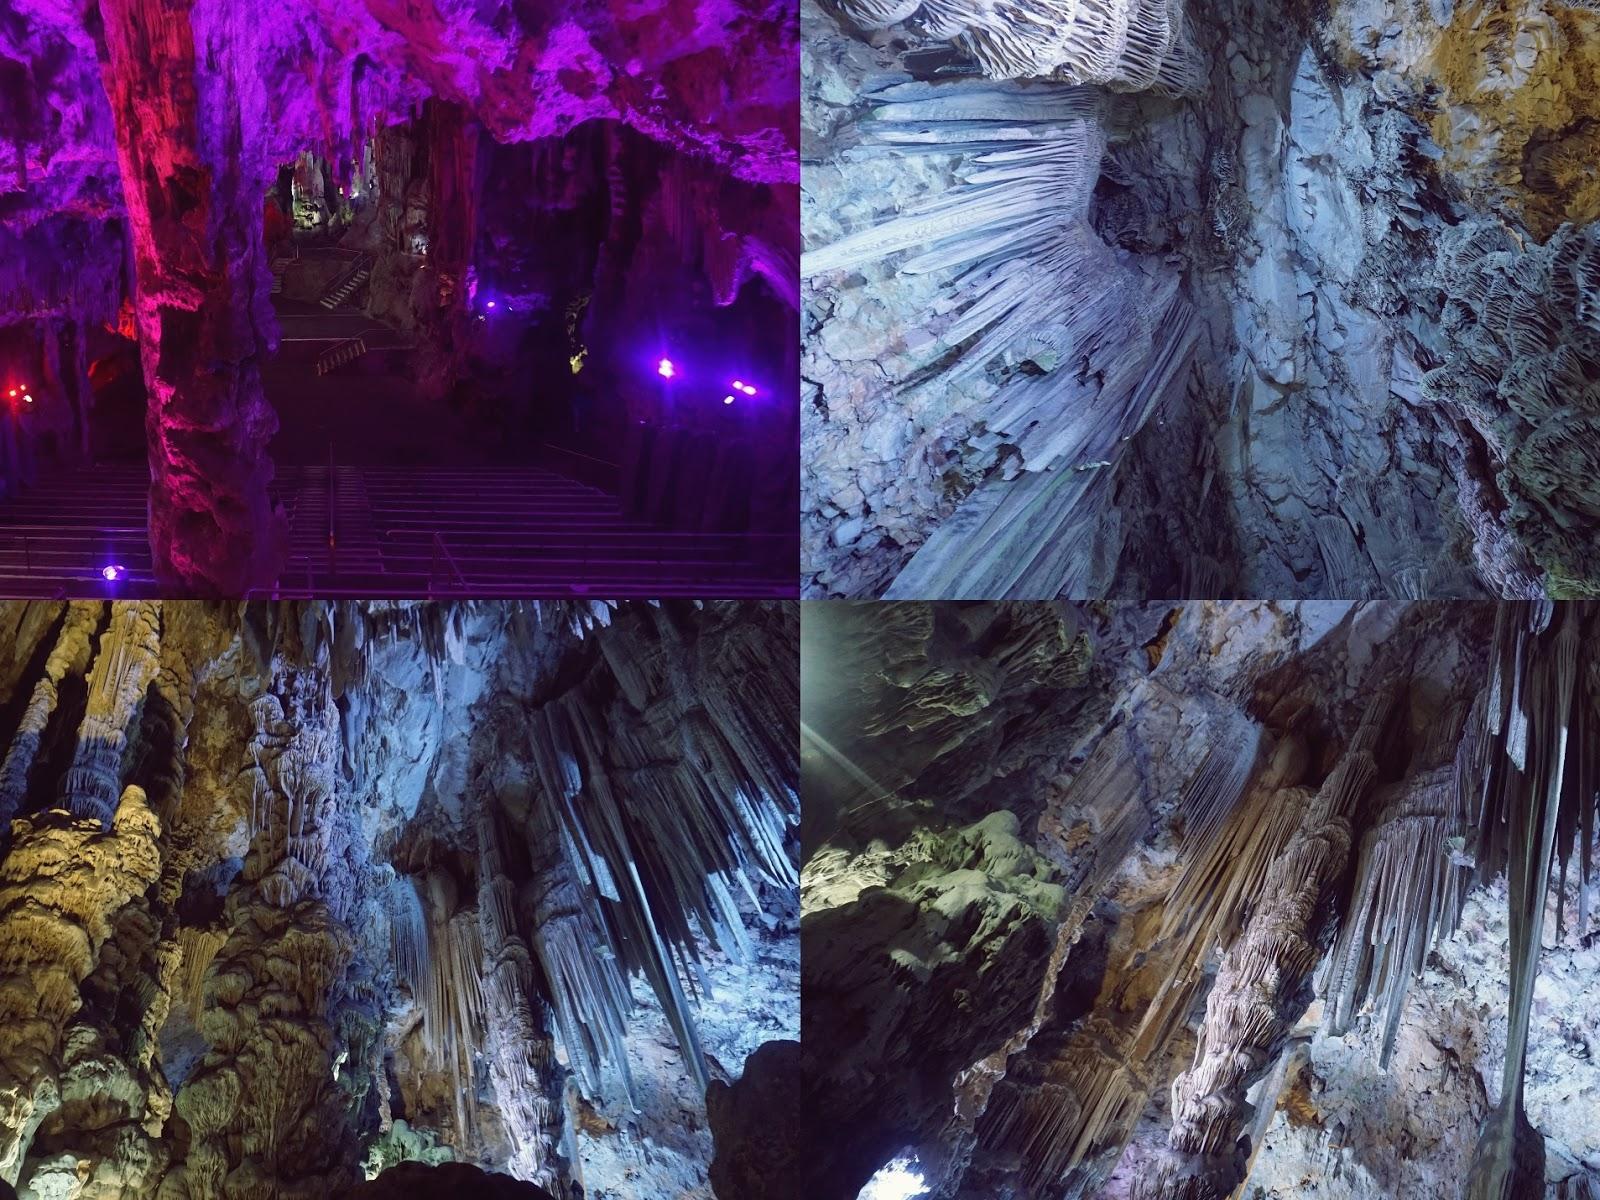 Jaskinia Św. Michała Gibraltar, jaskinia, Gibraltar, panidorcia, blog o podróżach, Hiszpania, skalaktyty, stalagmity